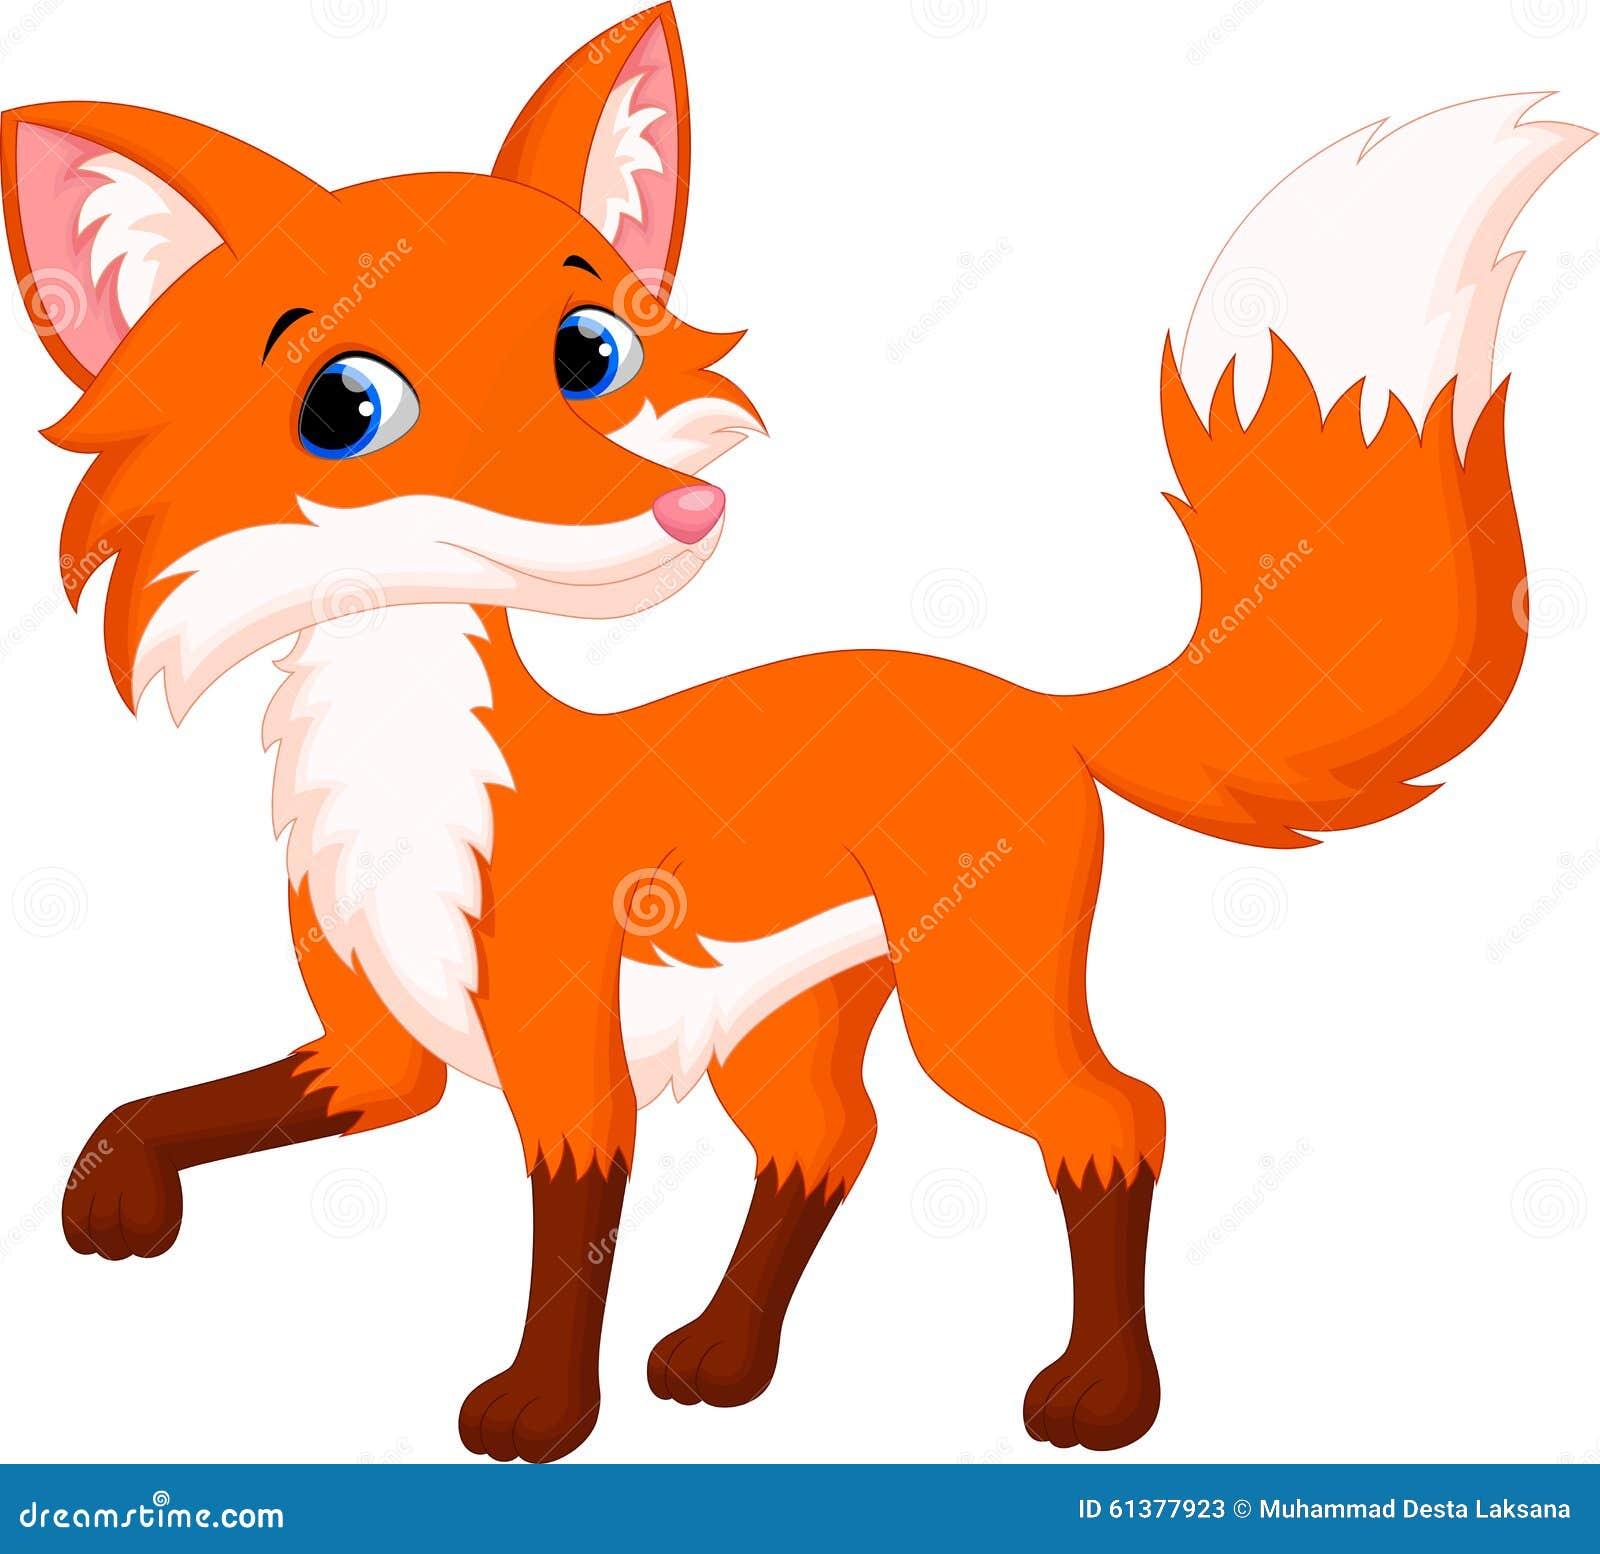 cute fox cartoon stock illustration image 61377923 hiker clip art images hiker clip art images